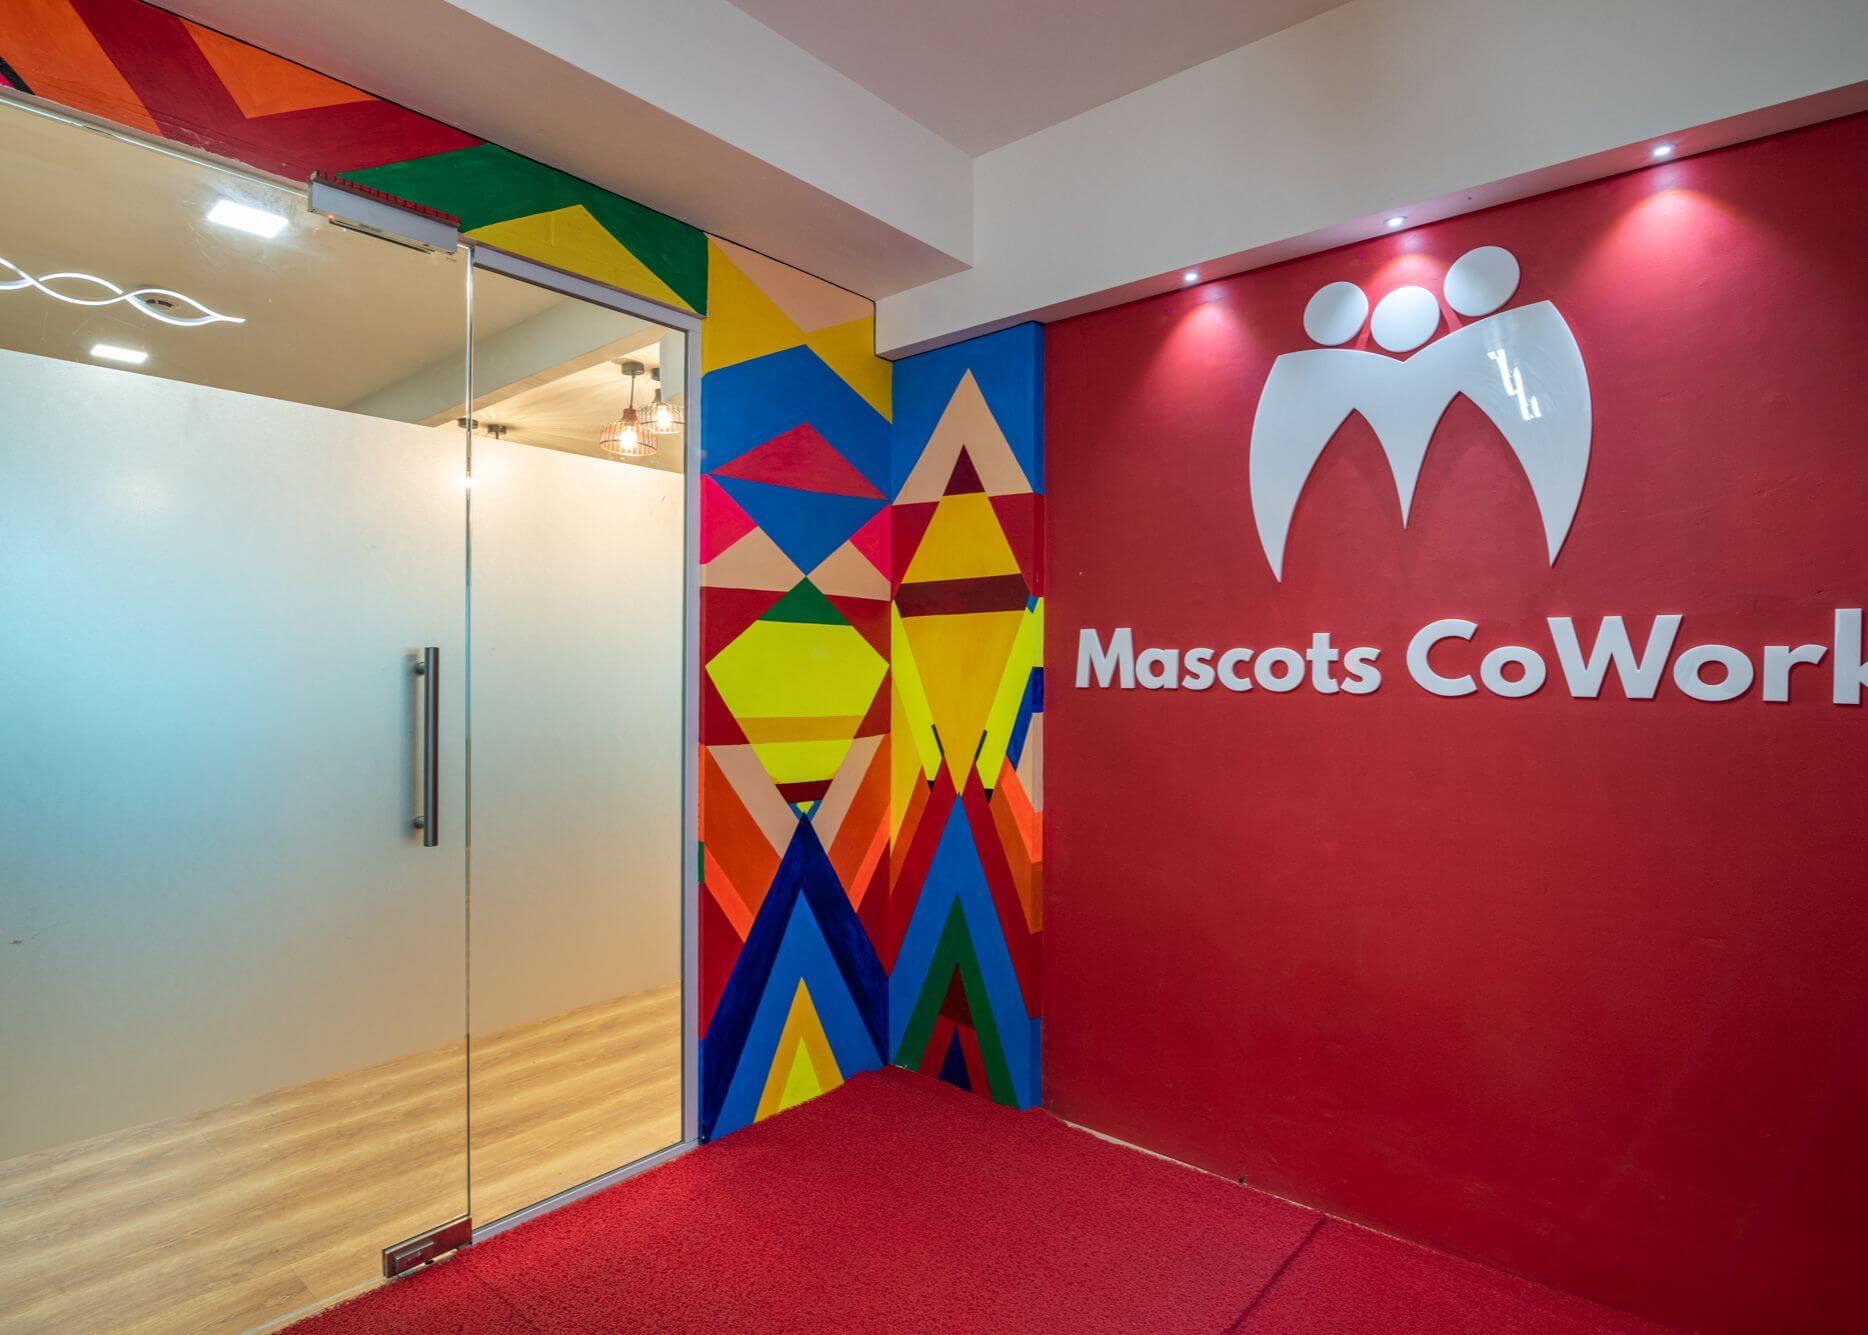 Mascots CoWork Scindia Society